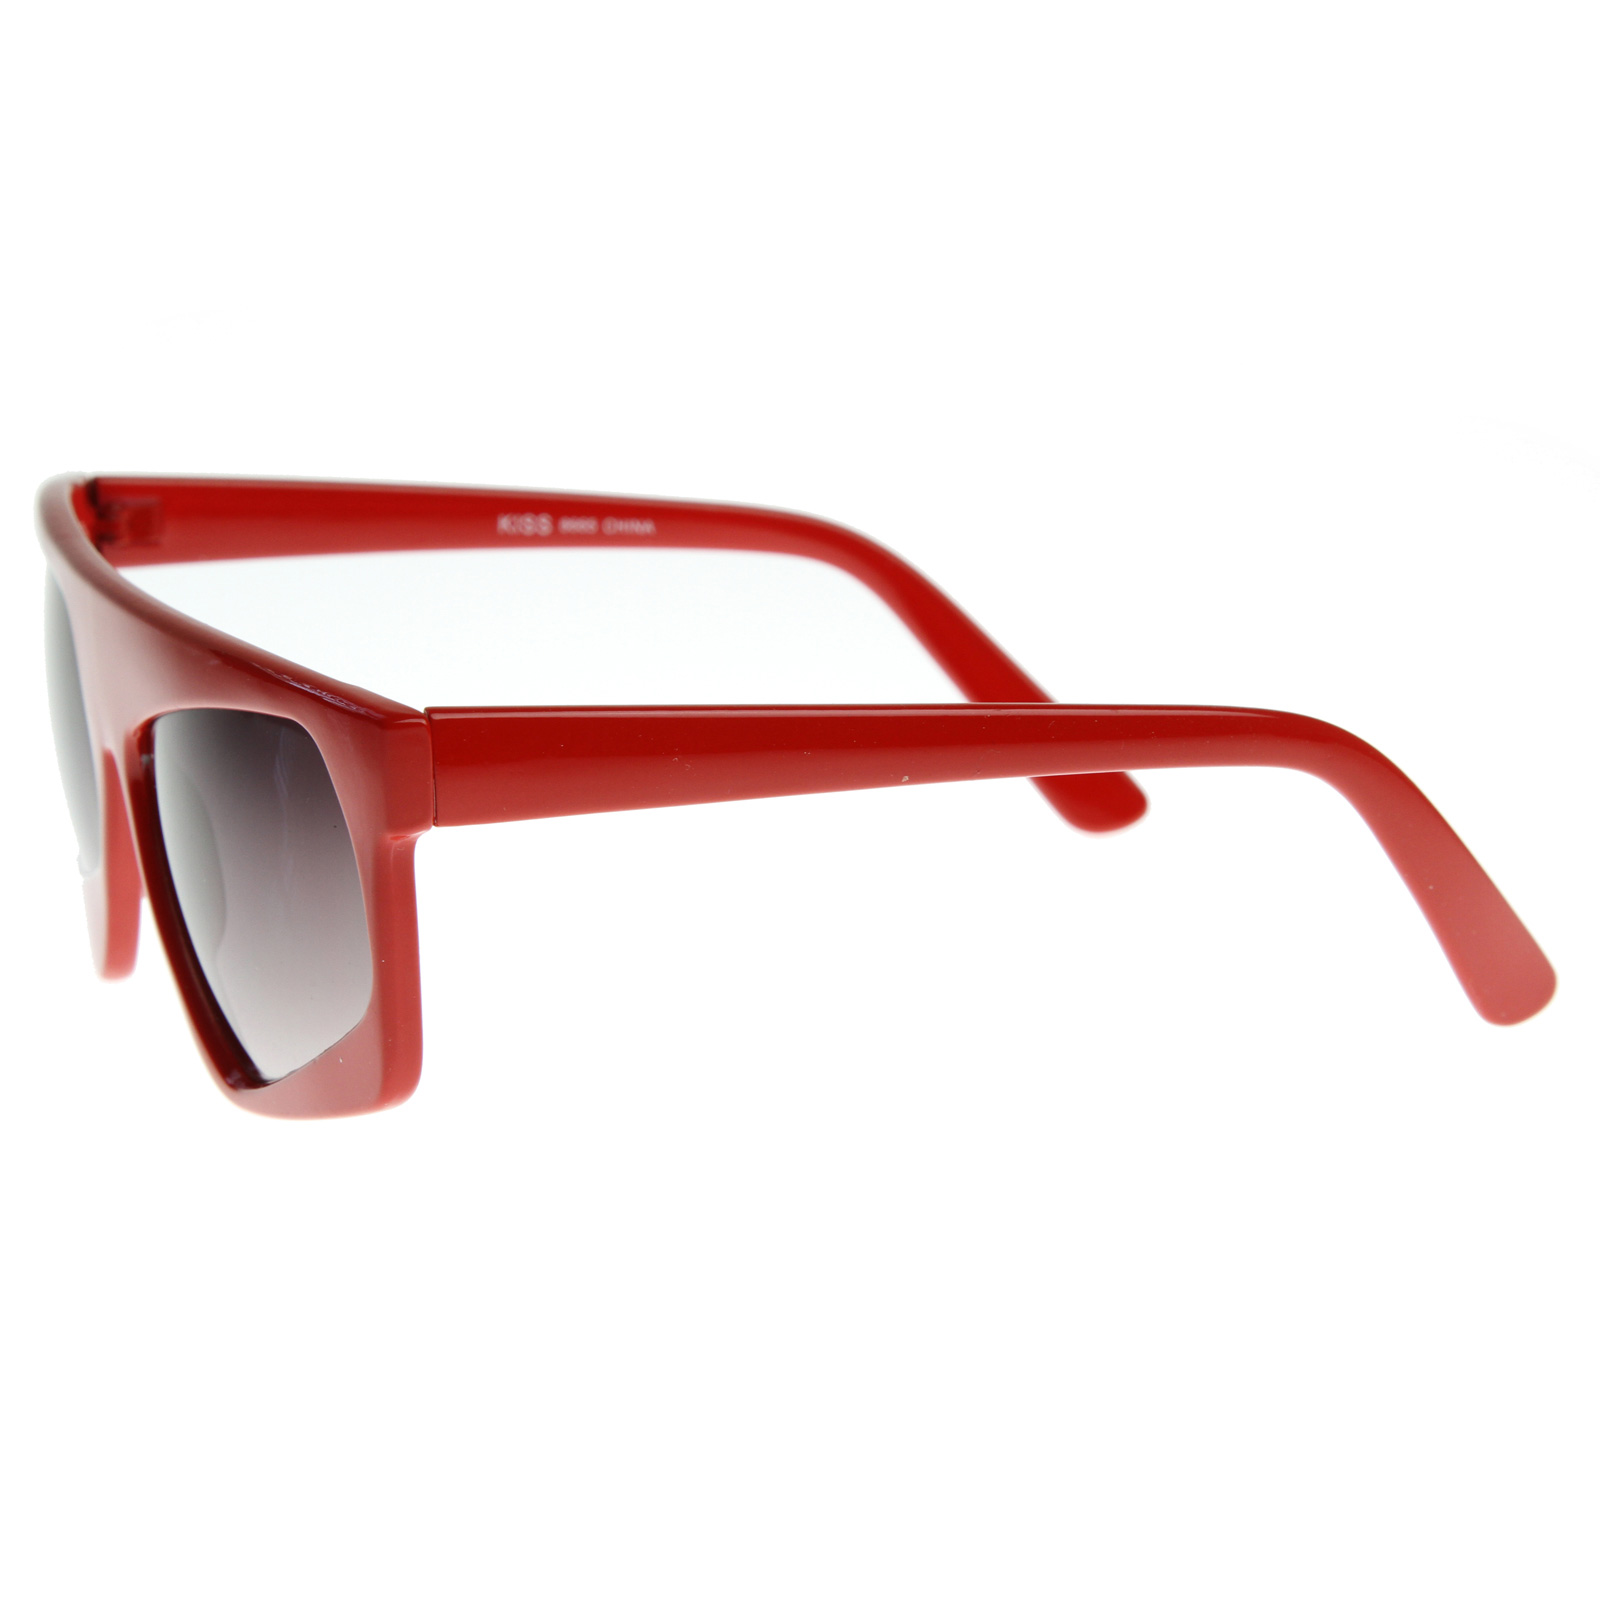 novelty sunglasses 2yom  novelty sunglasses